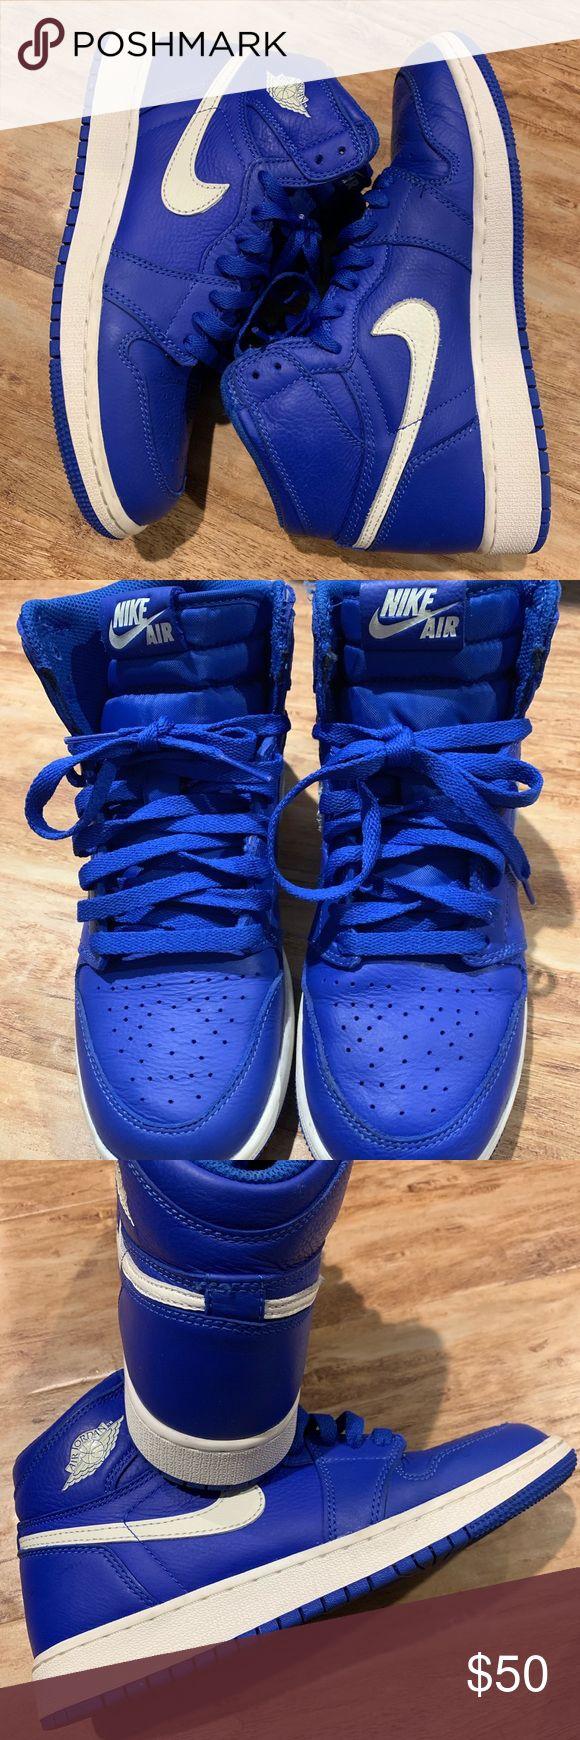 Nike Air Jordan Retro 1 Royal Blue size 6 youth Air